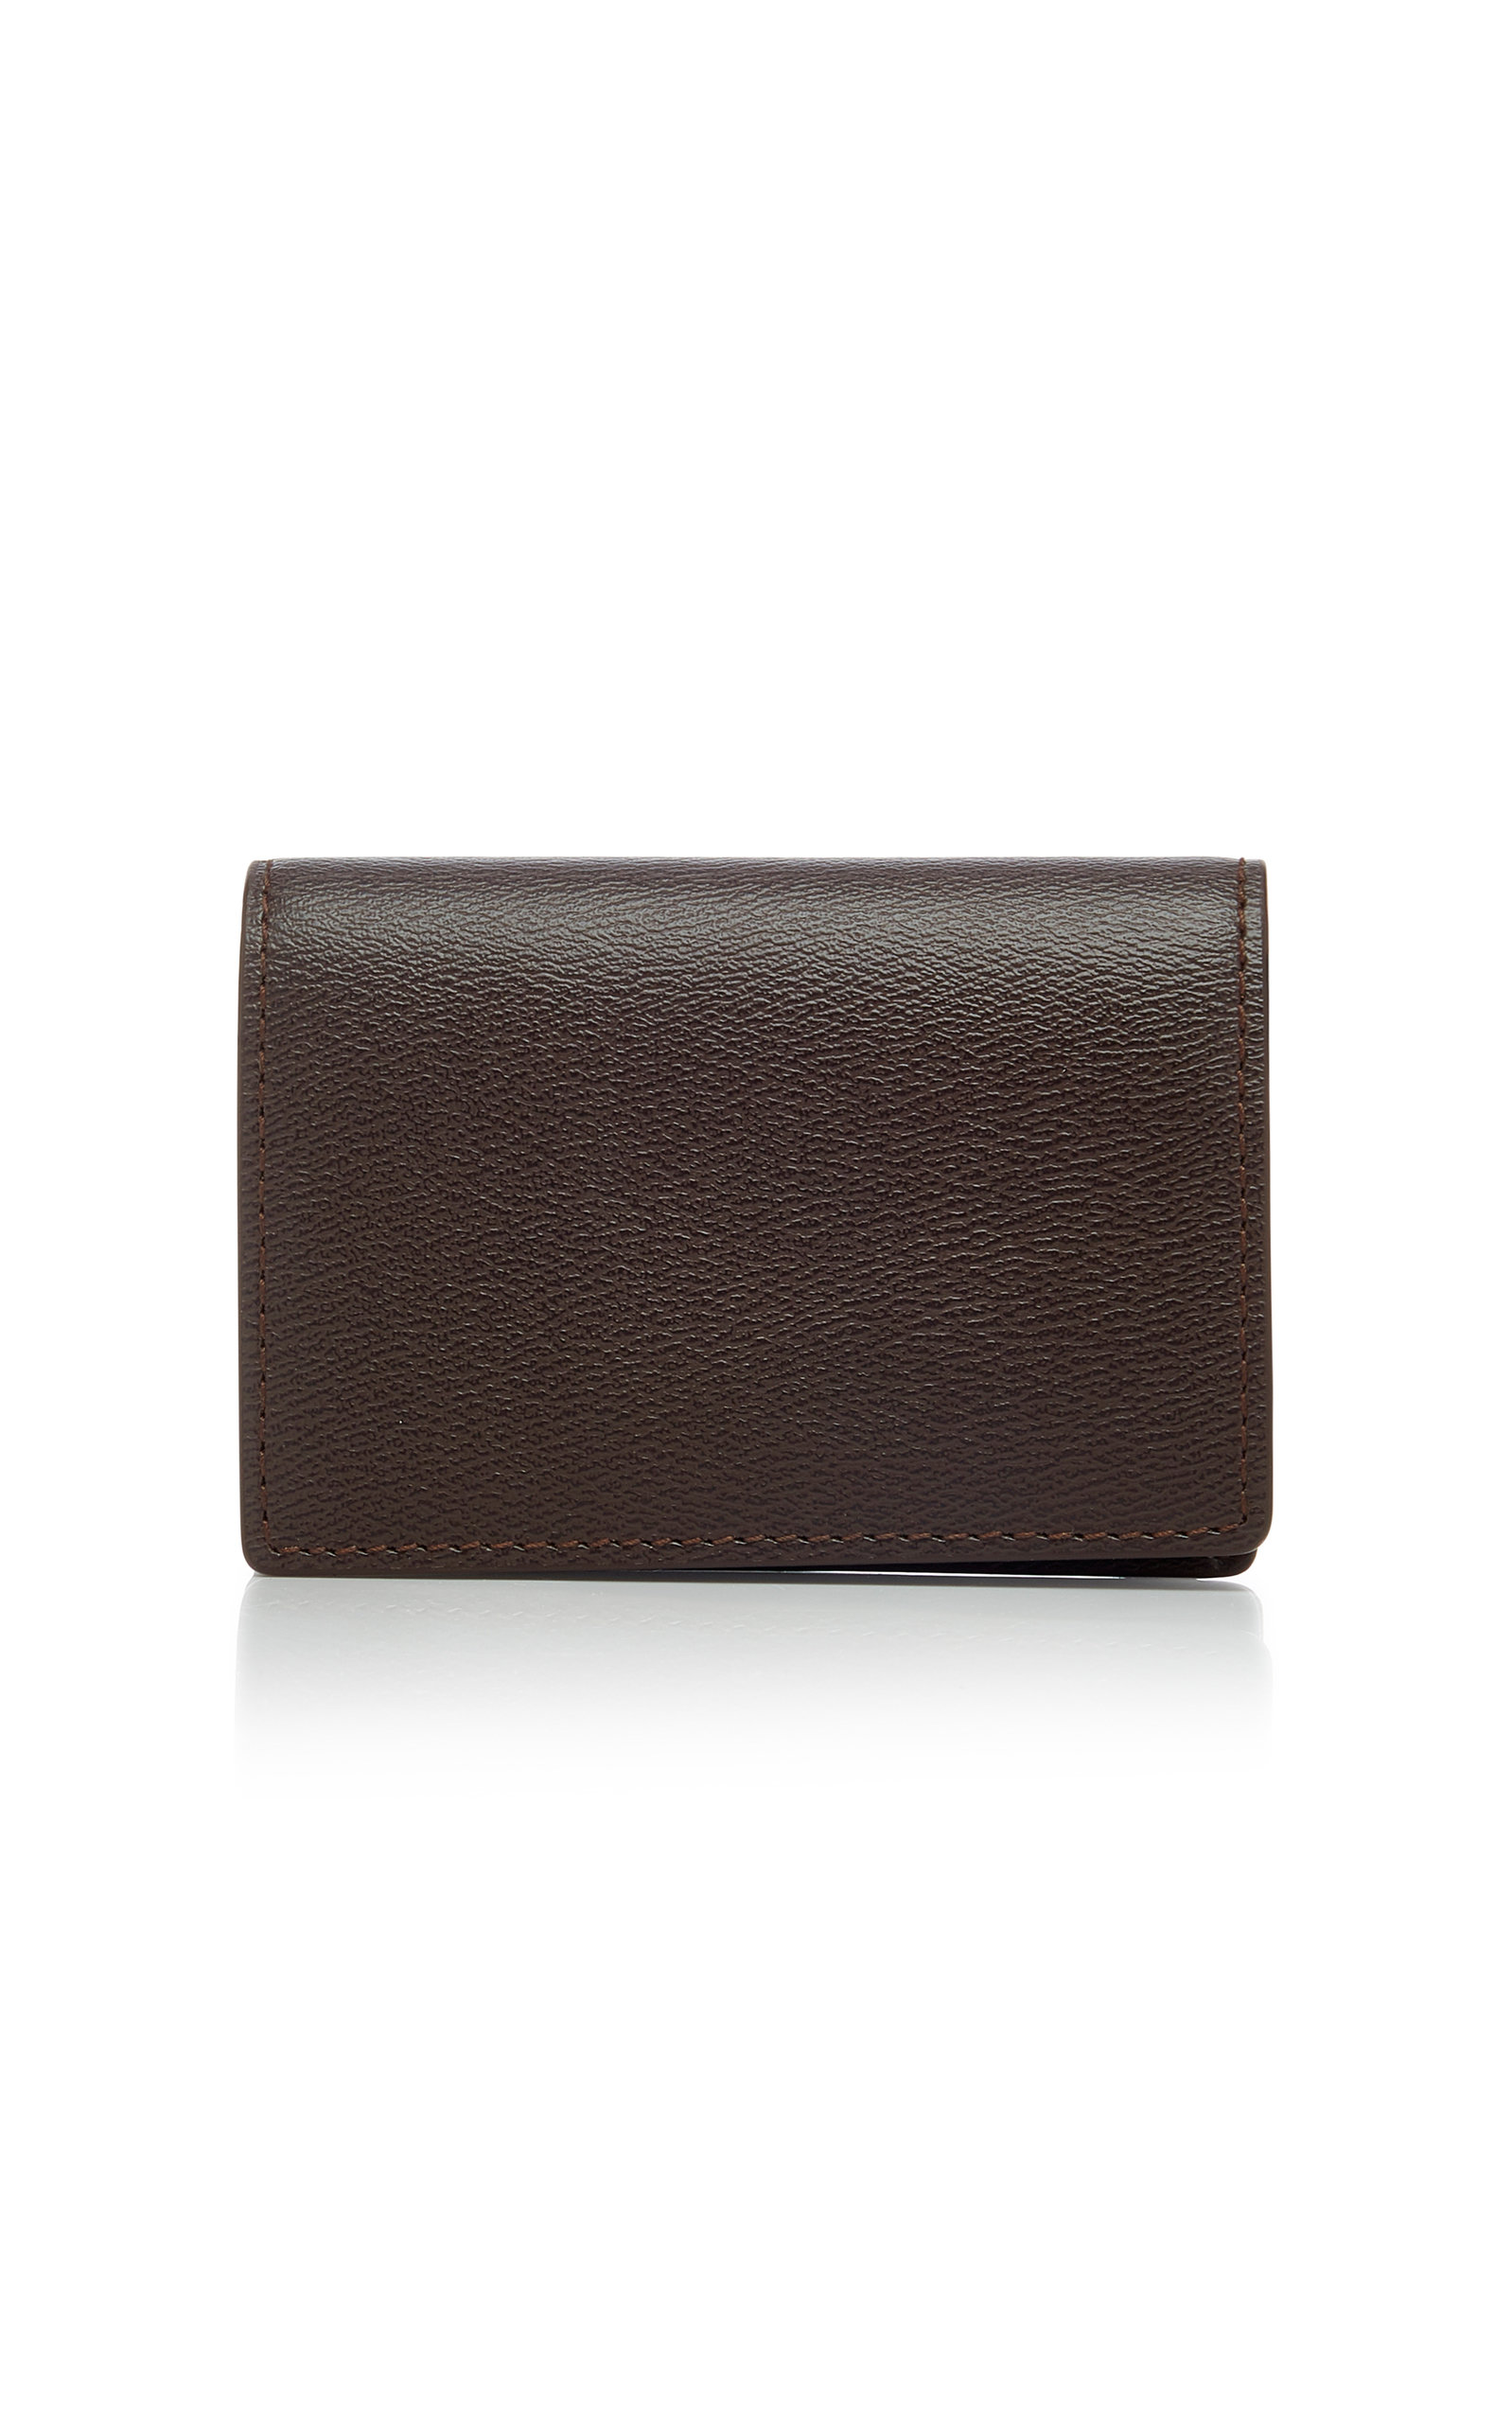 5cb60cafea5 Grosvenor Textured-Leather Cardholder by Smythson   Moda Operandi